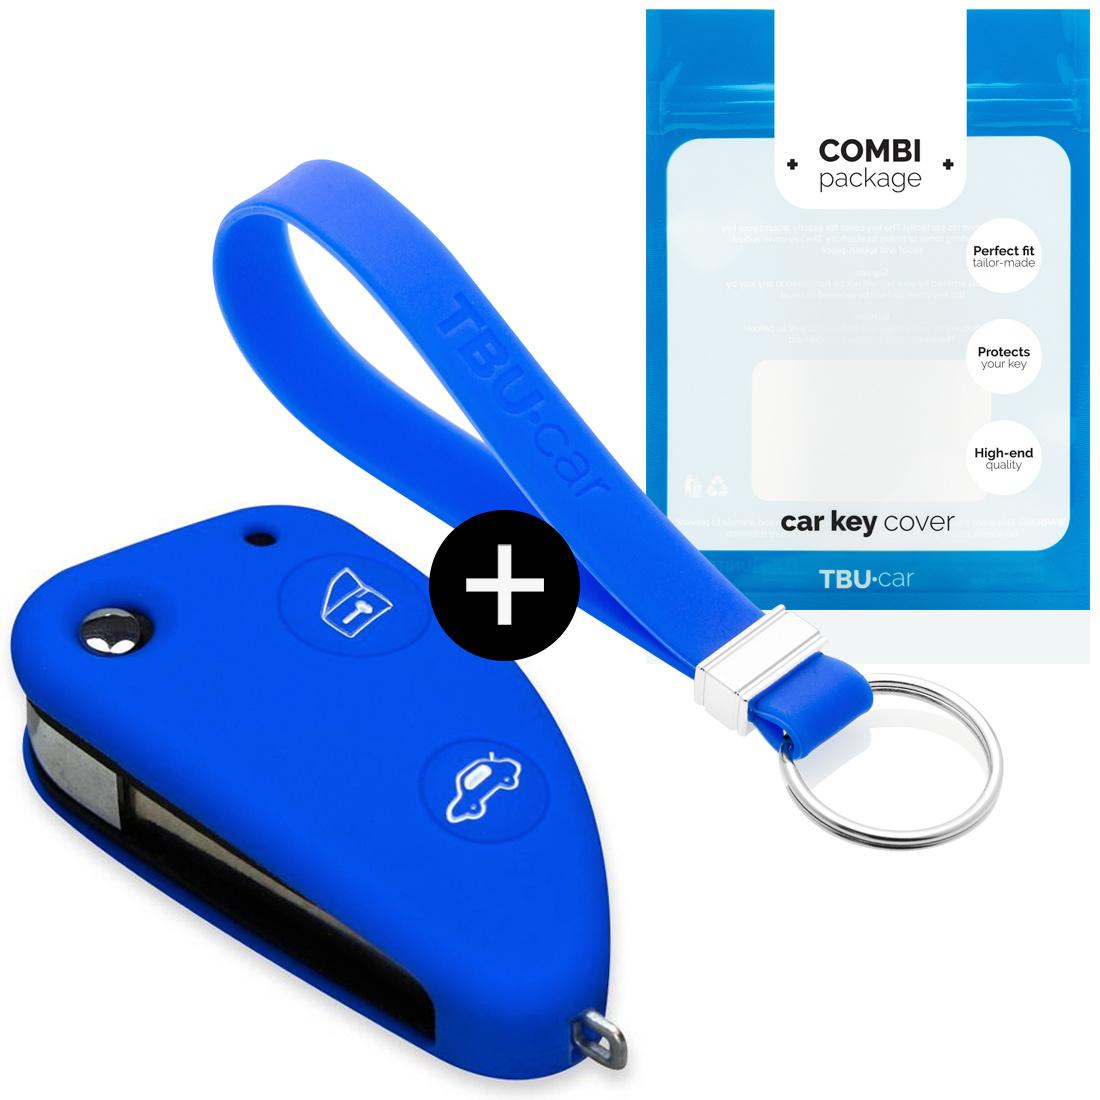 TBU car TBU car Autoschlüssel Hülle kompatibel mit Alfa Romeo 2 Tasten - Schutzhülle aus Silikon - Auto Schlüsselhülle Cover in Blau